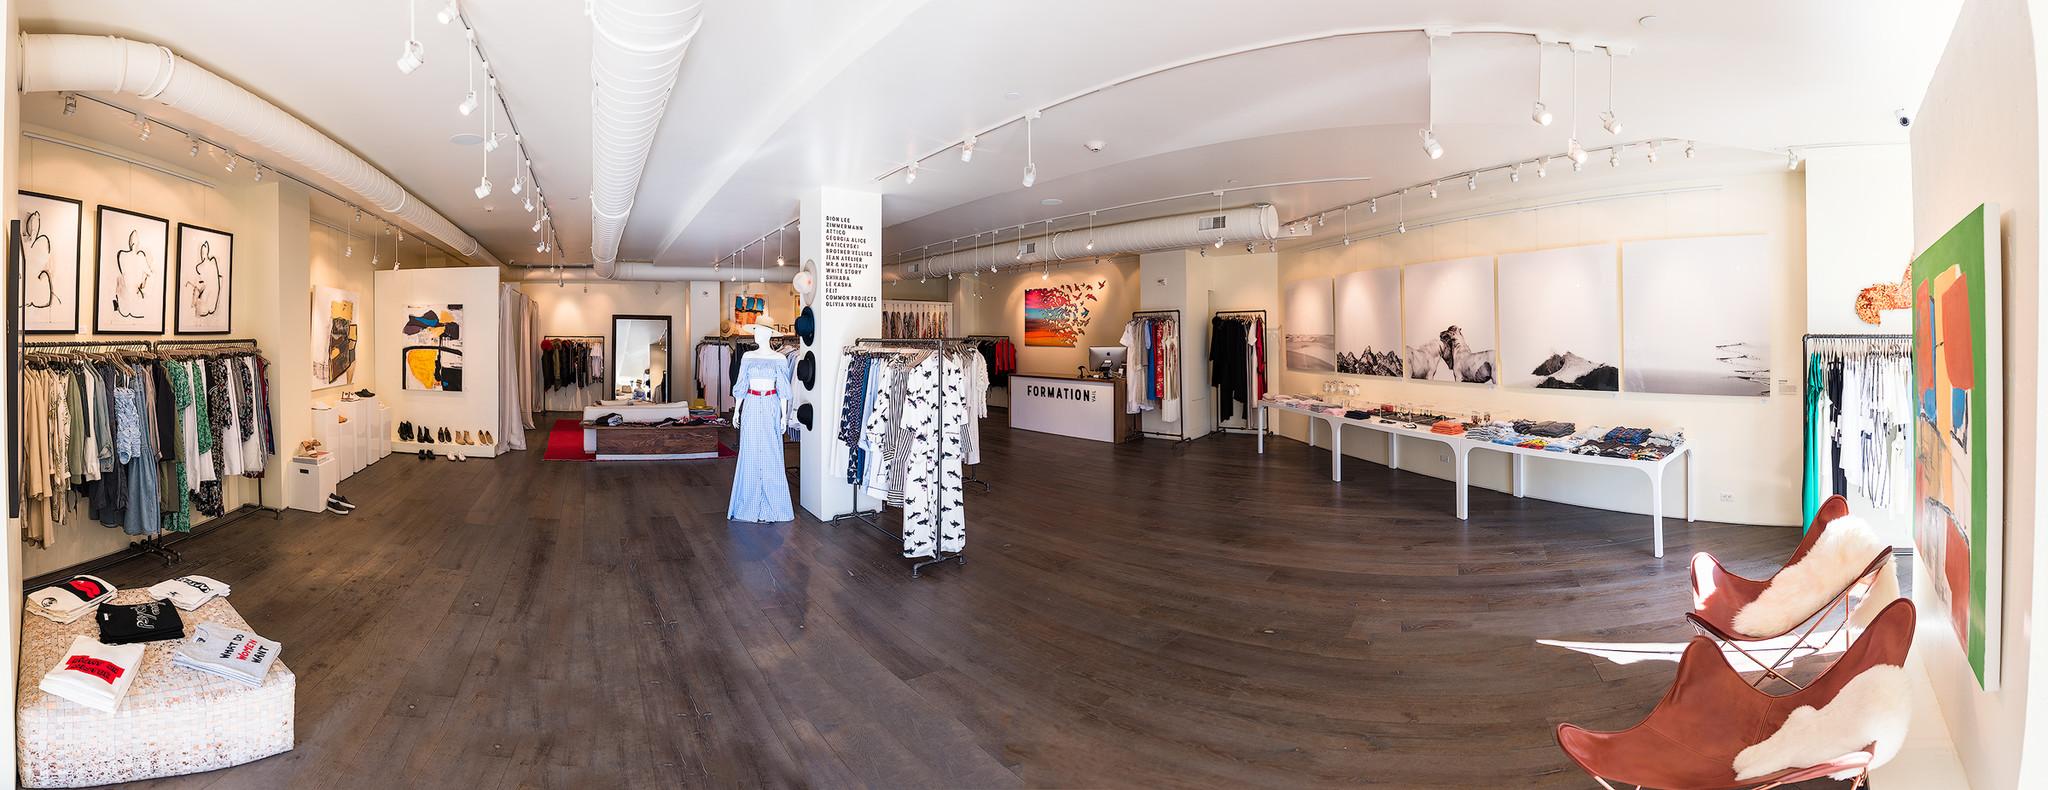 Inside Formation Boutique